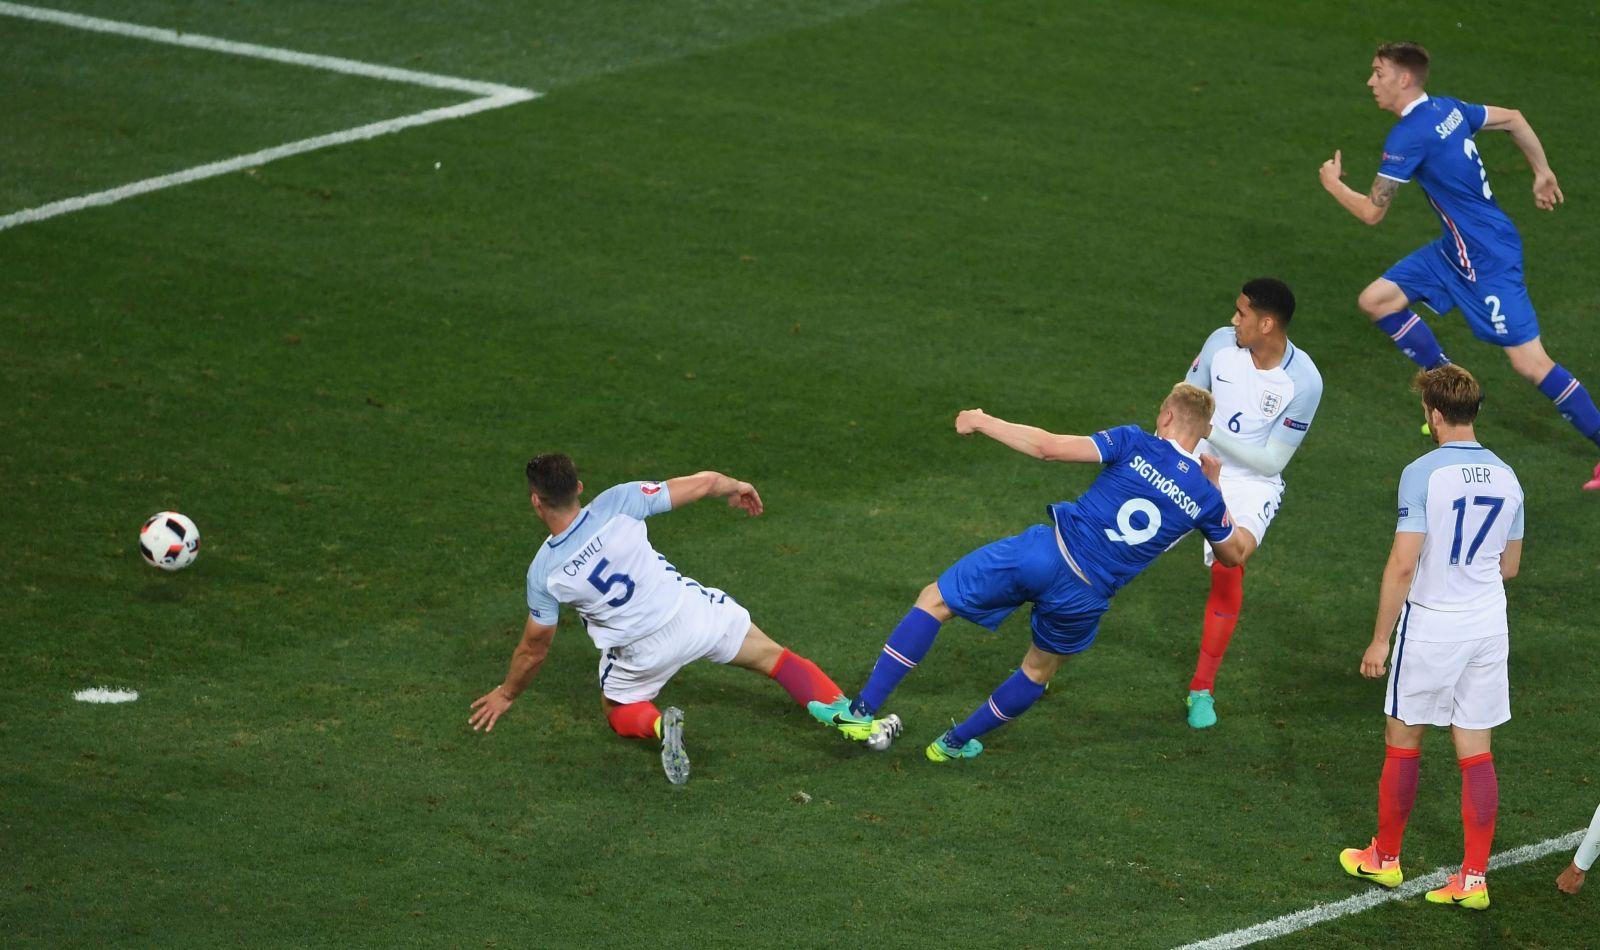 Сенсация на Евро-2016!!! Исландцы поставили на колени англичан!!!